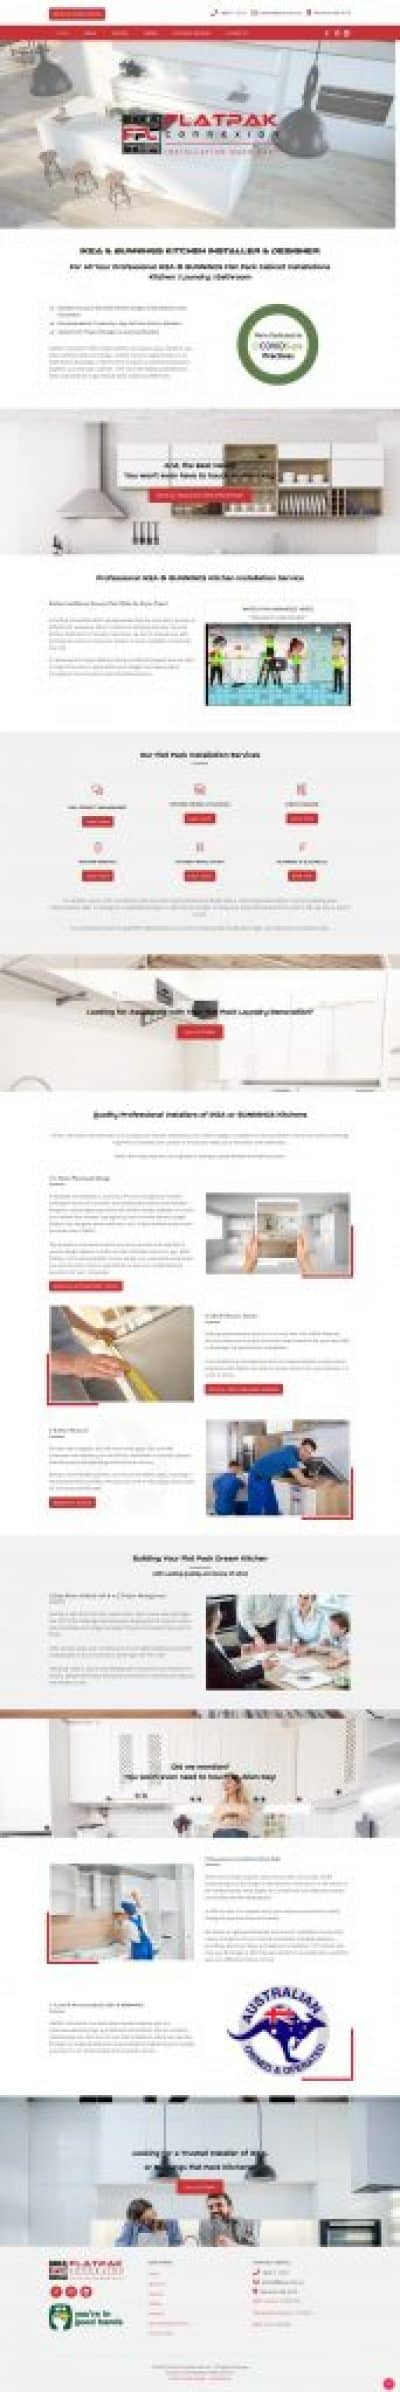 FlatPak ConneXion Caboolture - Cabinet Maker Website_web2